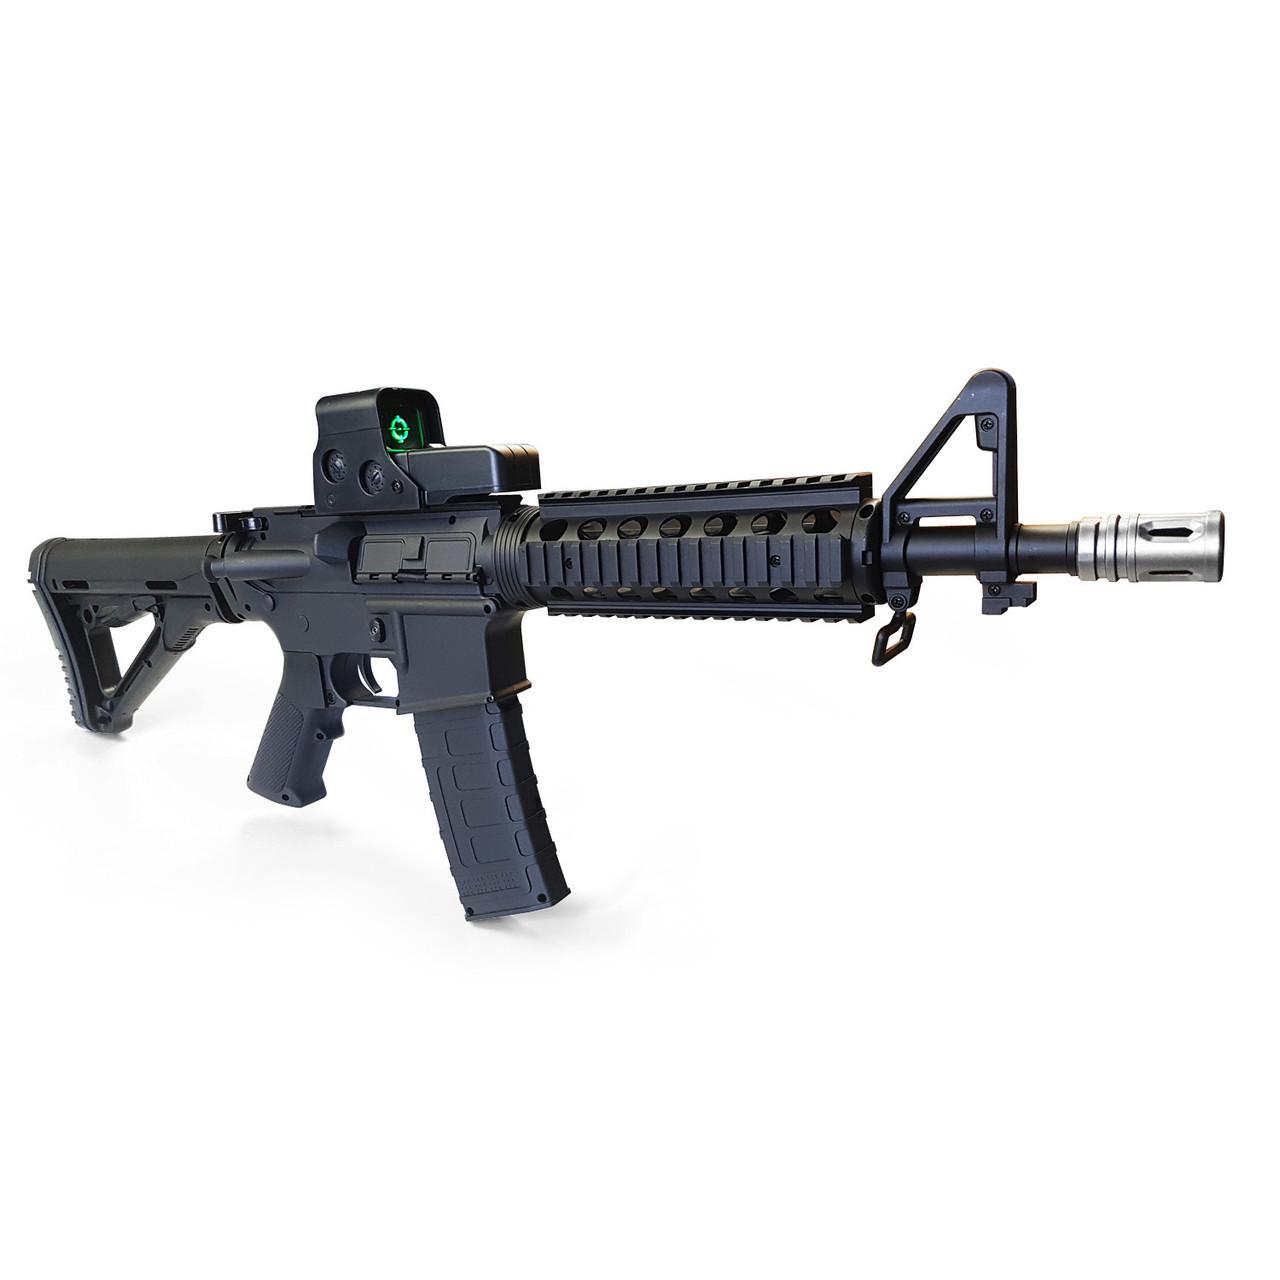 Игрушечная винтовка M4A1 на орбизах, колиматор, стреляет очередью, на аккумуляторе, мягкие пули, автомат м16